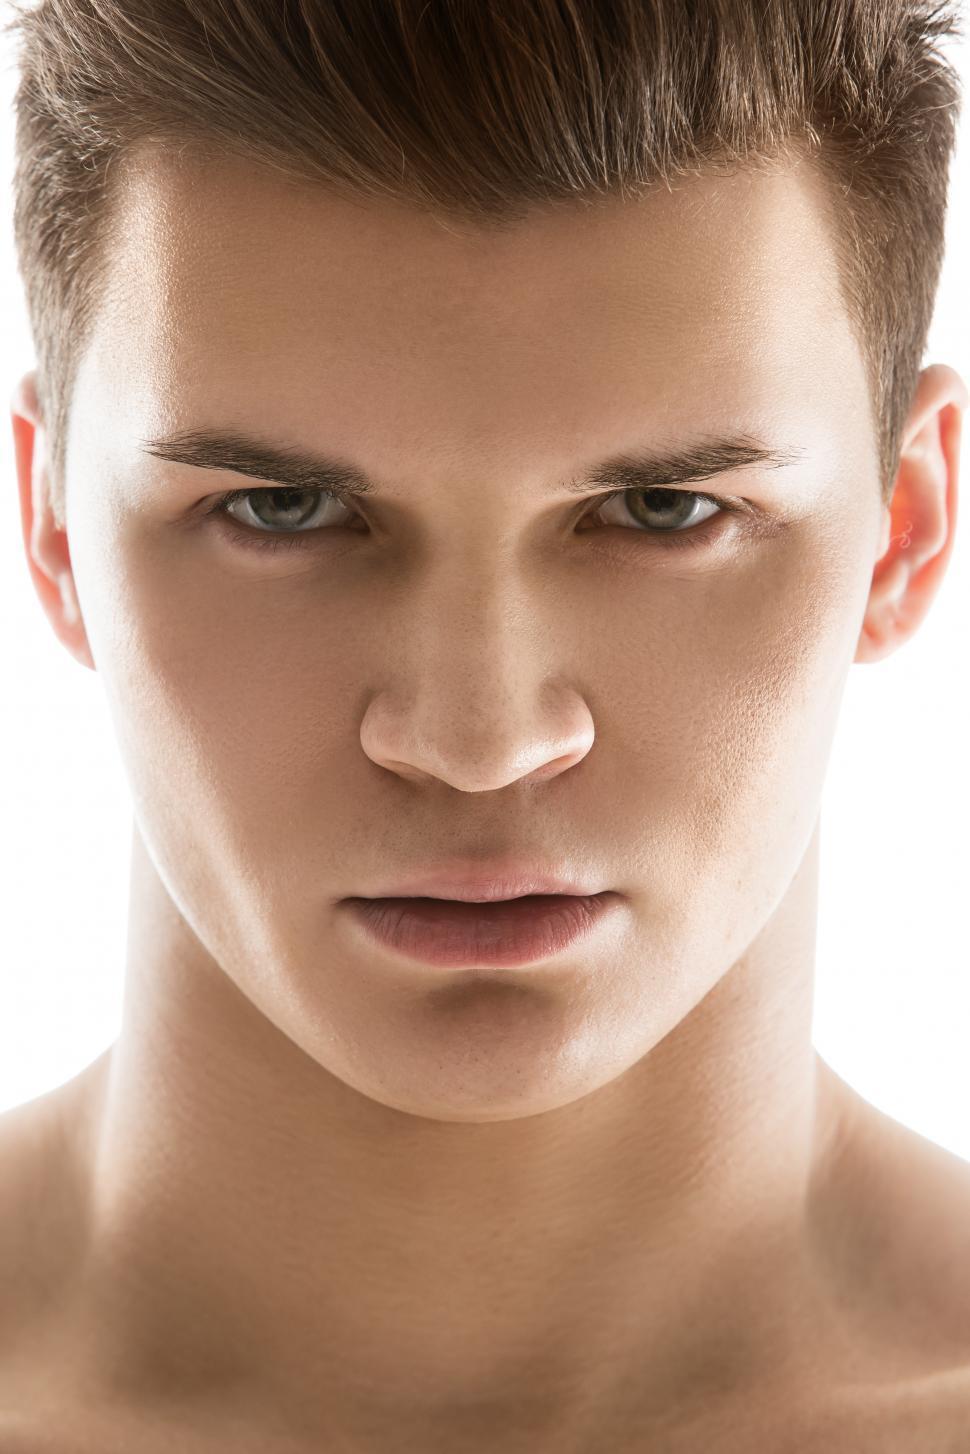 Download Free Stock Photo of Dramatic headshot of man on white background